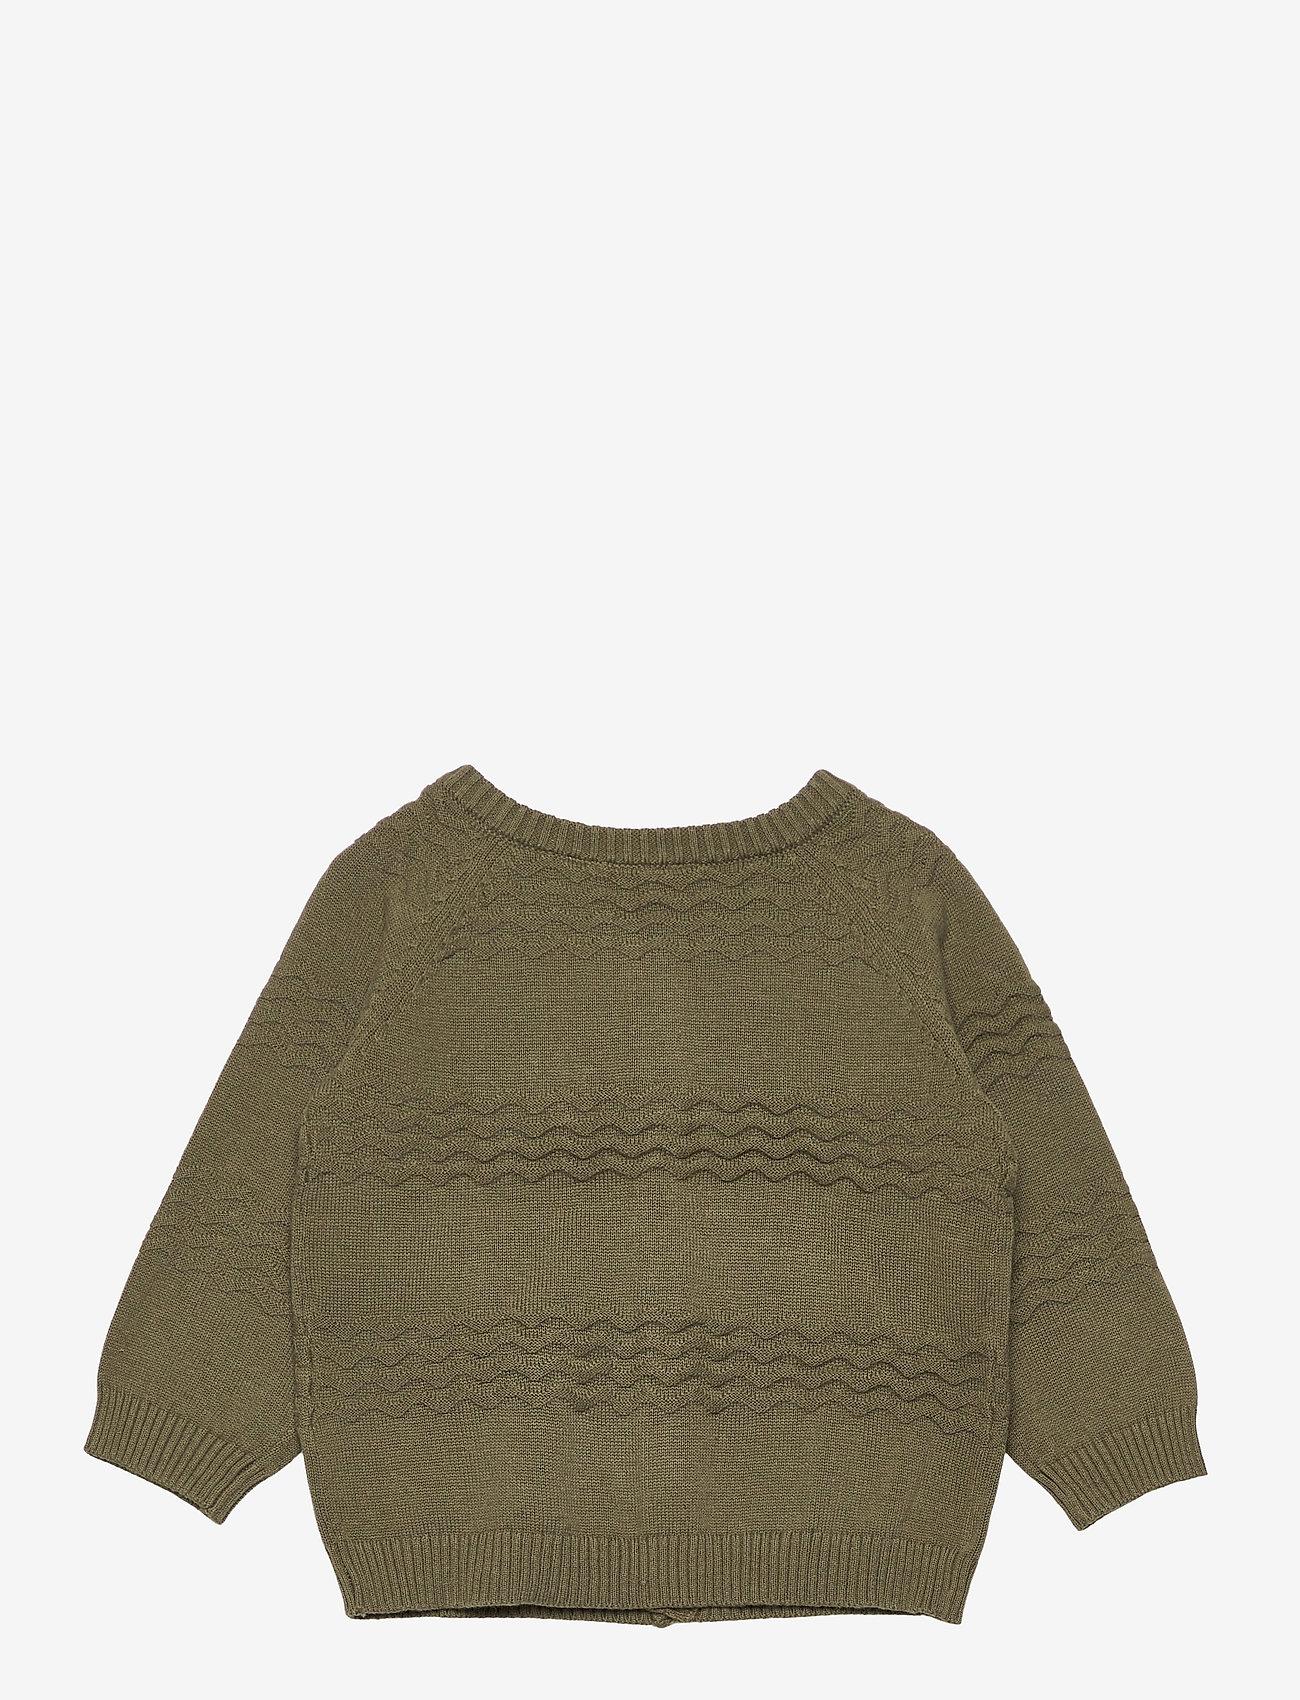 name it - NBMDESET LS KNIT CARD - gilets - ivy green - 1